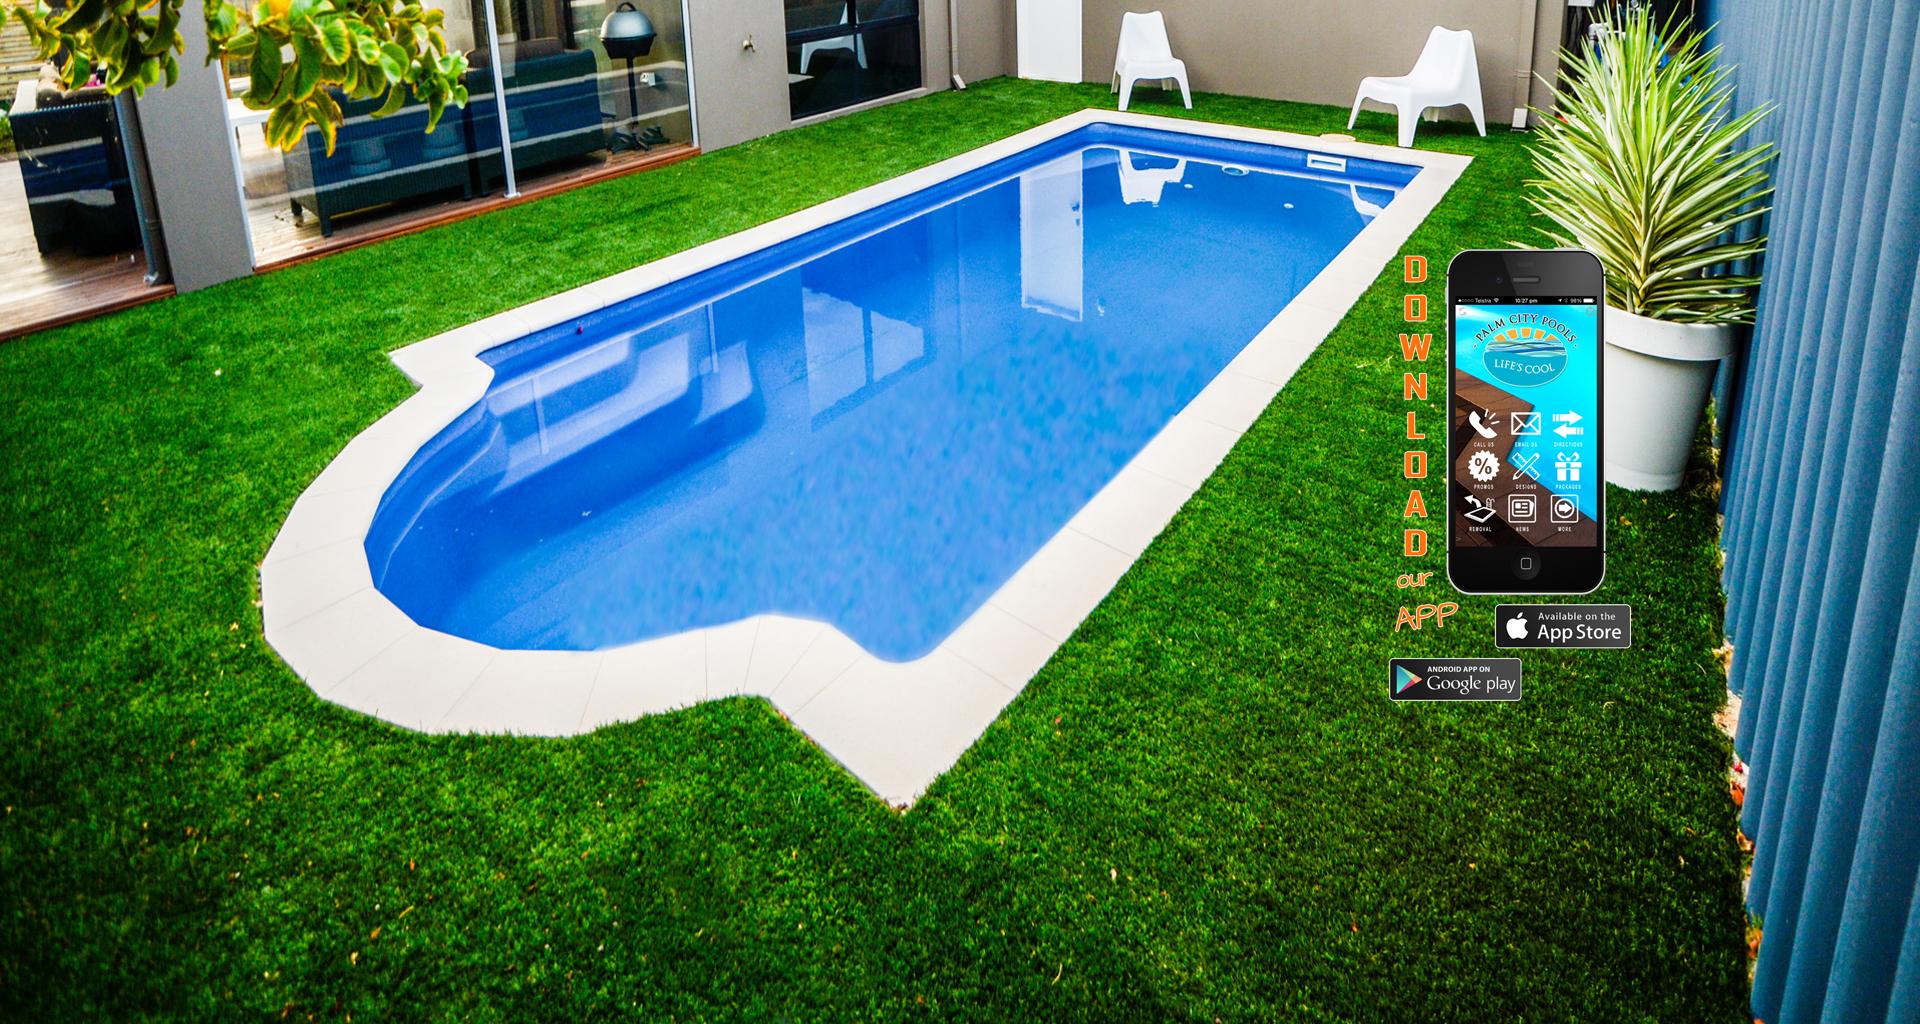 Palm City Pools App Image2